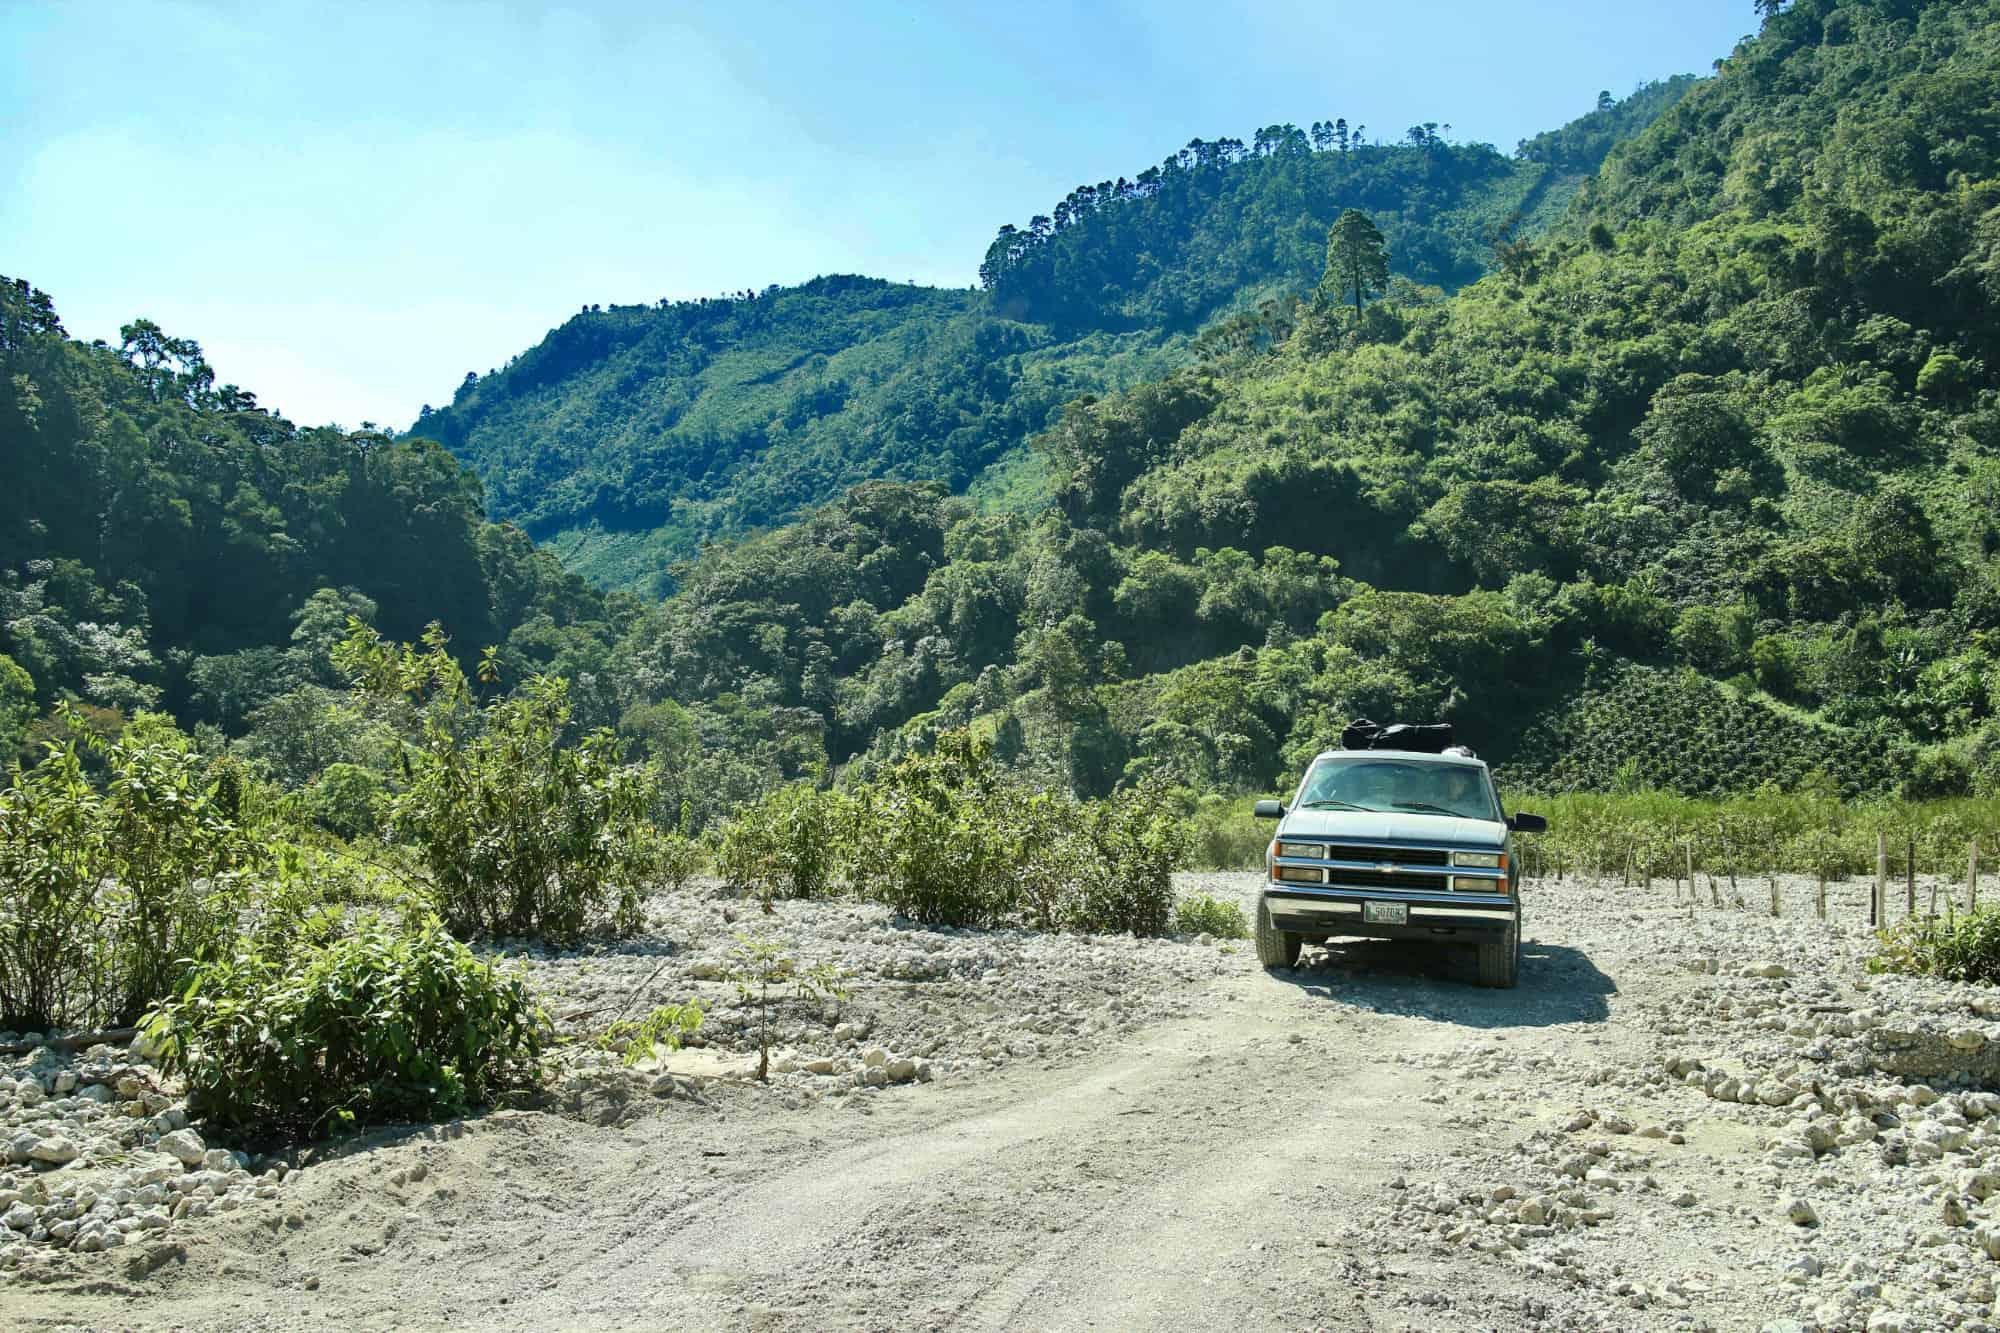 Suburban en route to Laguna Brava Yalambojoch